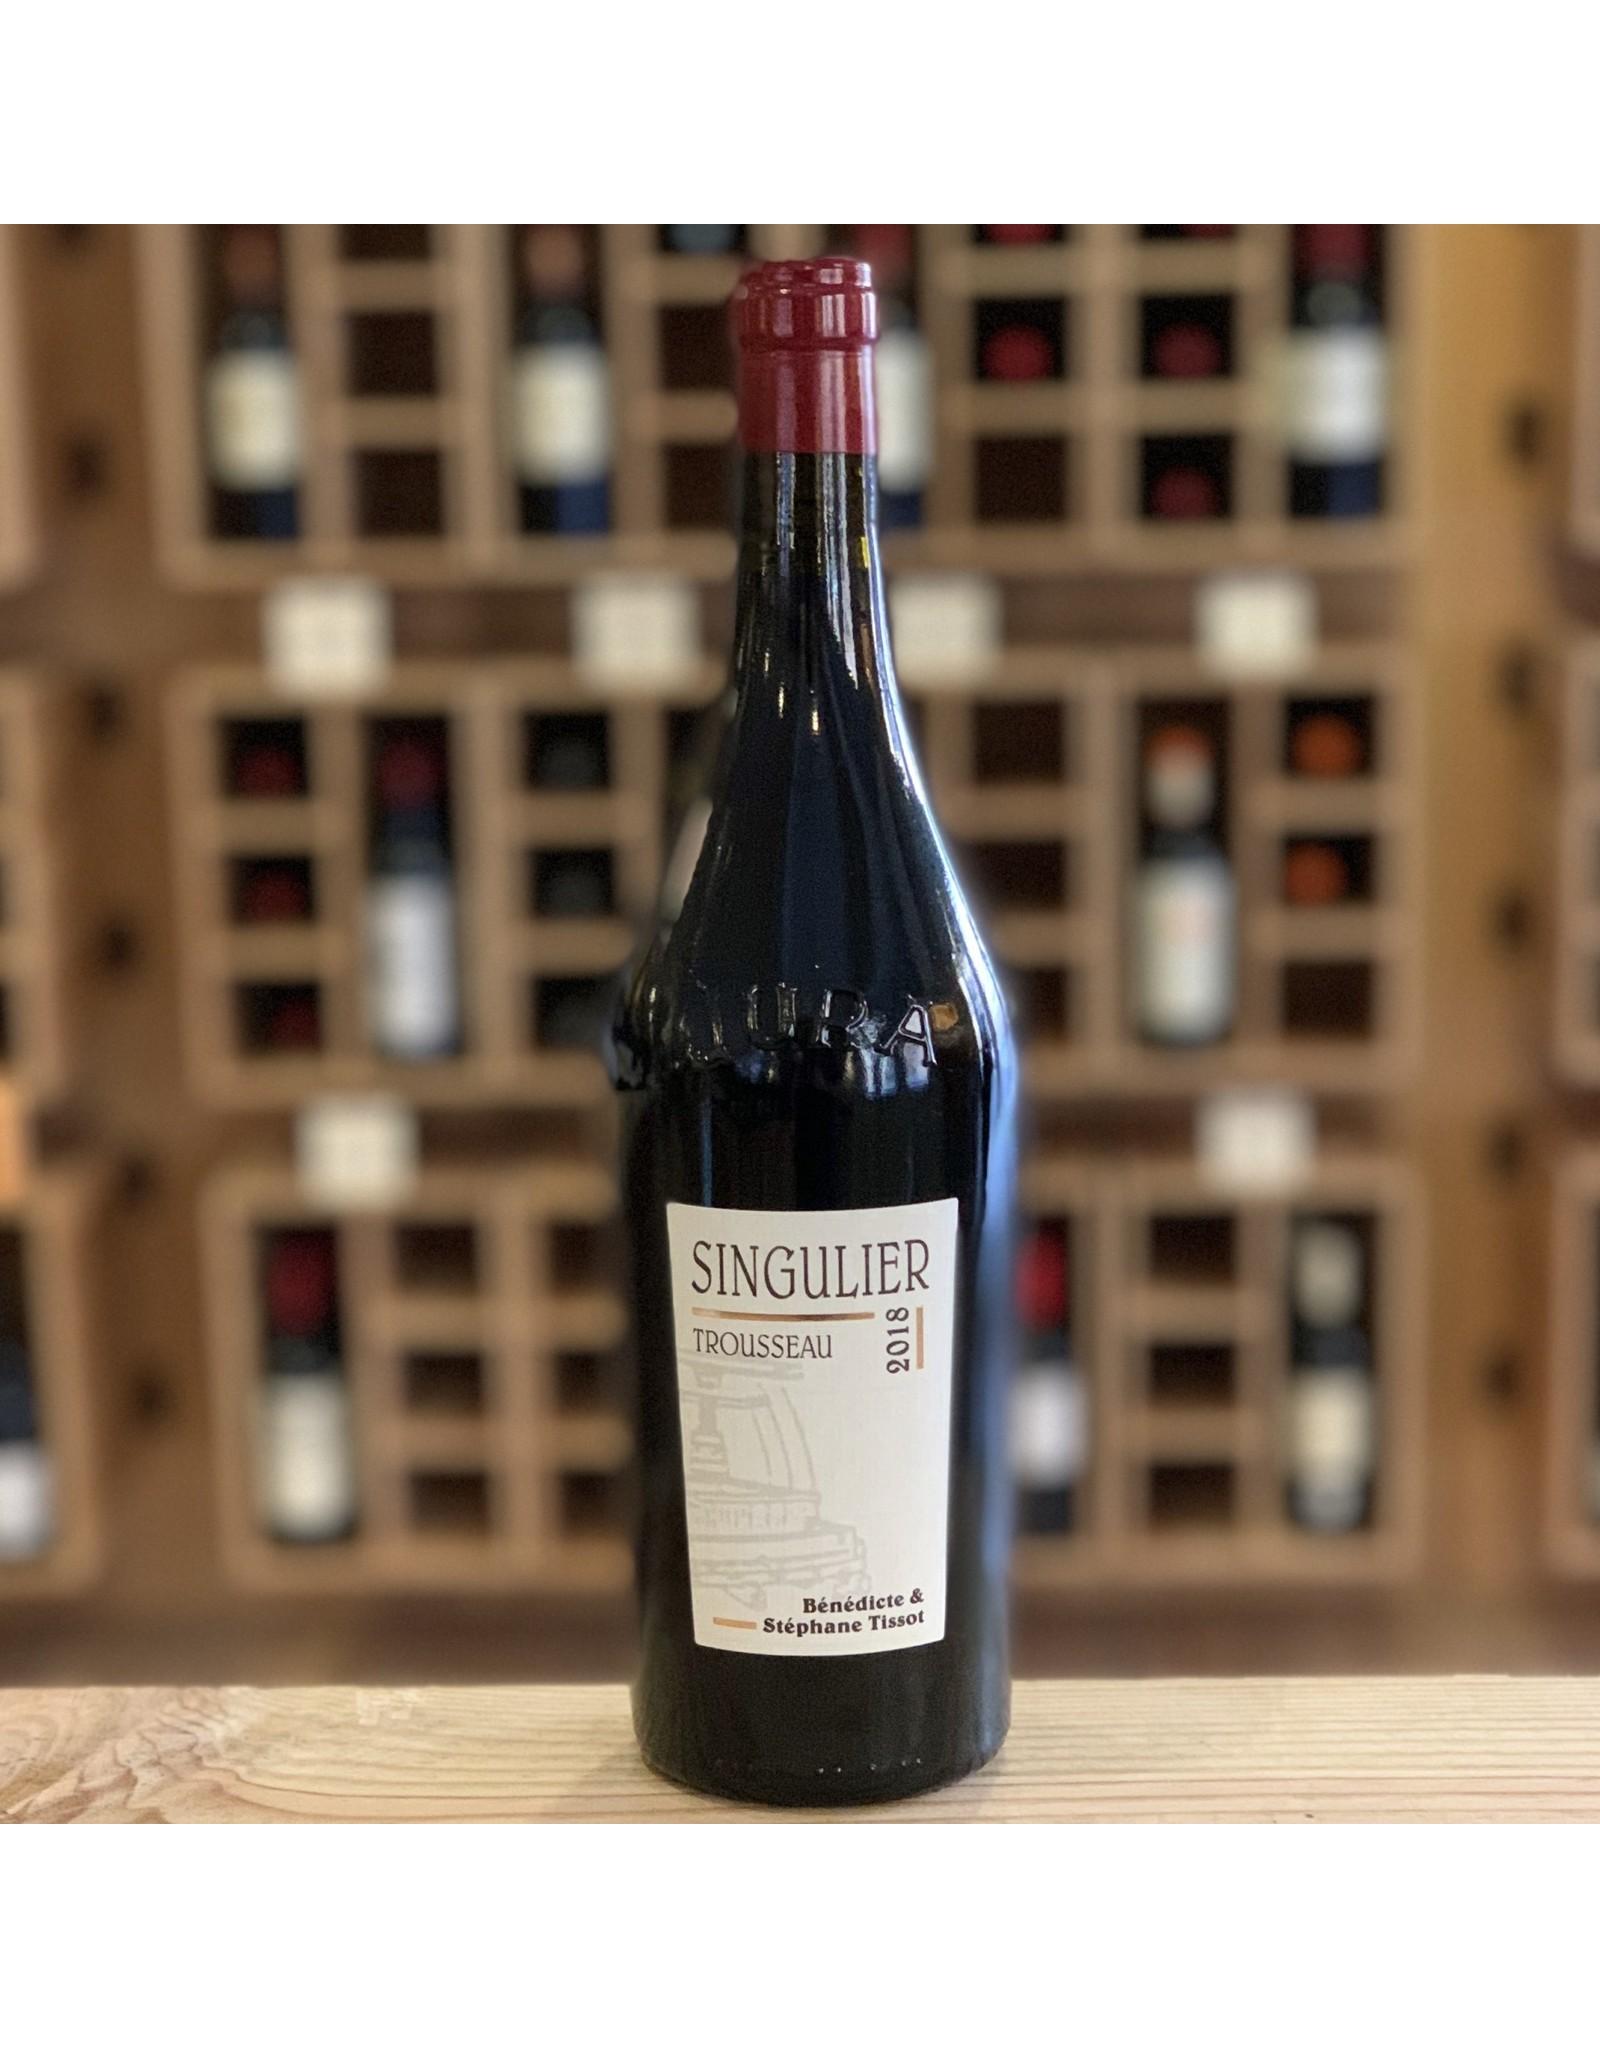 Vegan Tissot ''Singulier'' Arbois Trousseau 2018 - Jura, France